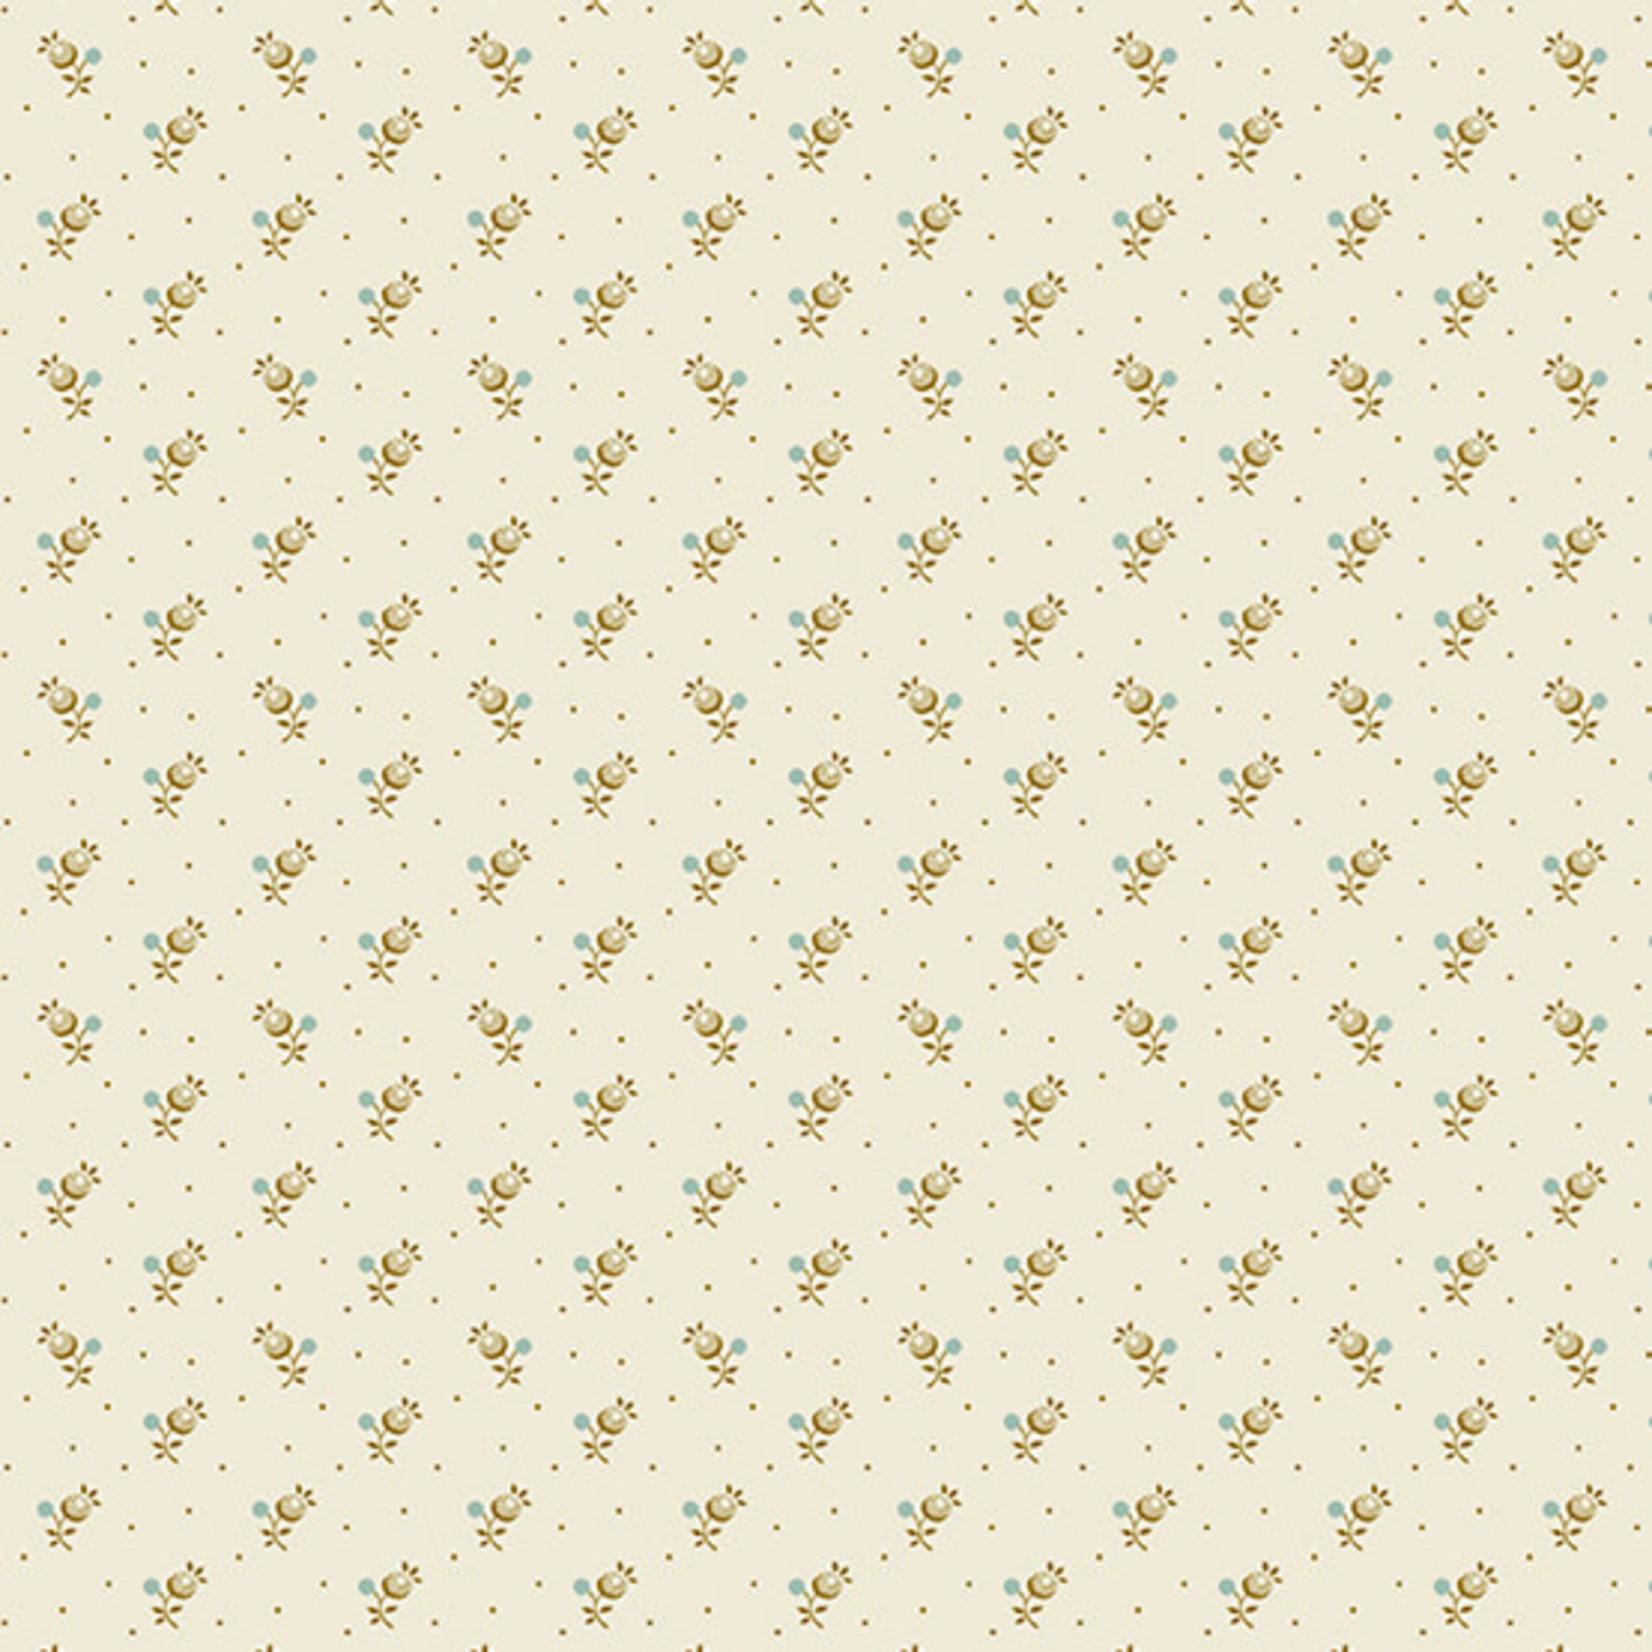 Edyta Sitar Secret Stash - Neutrals, Forget-Me-Not, Cream (9460-L) $0.20 per cm or $20/m